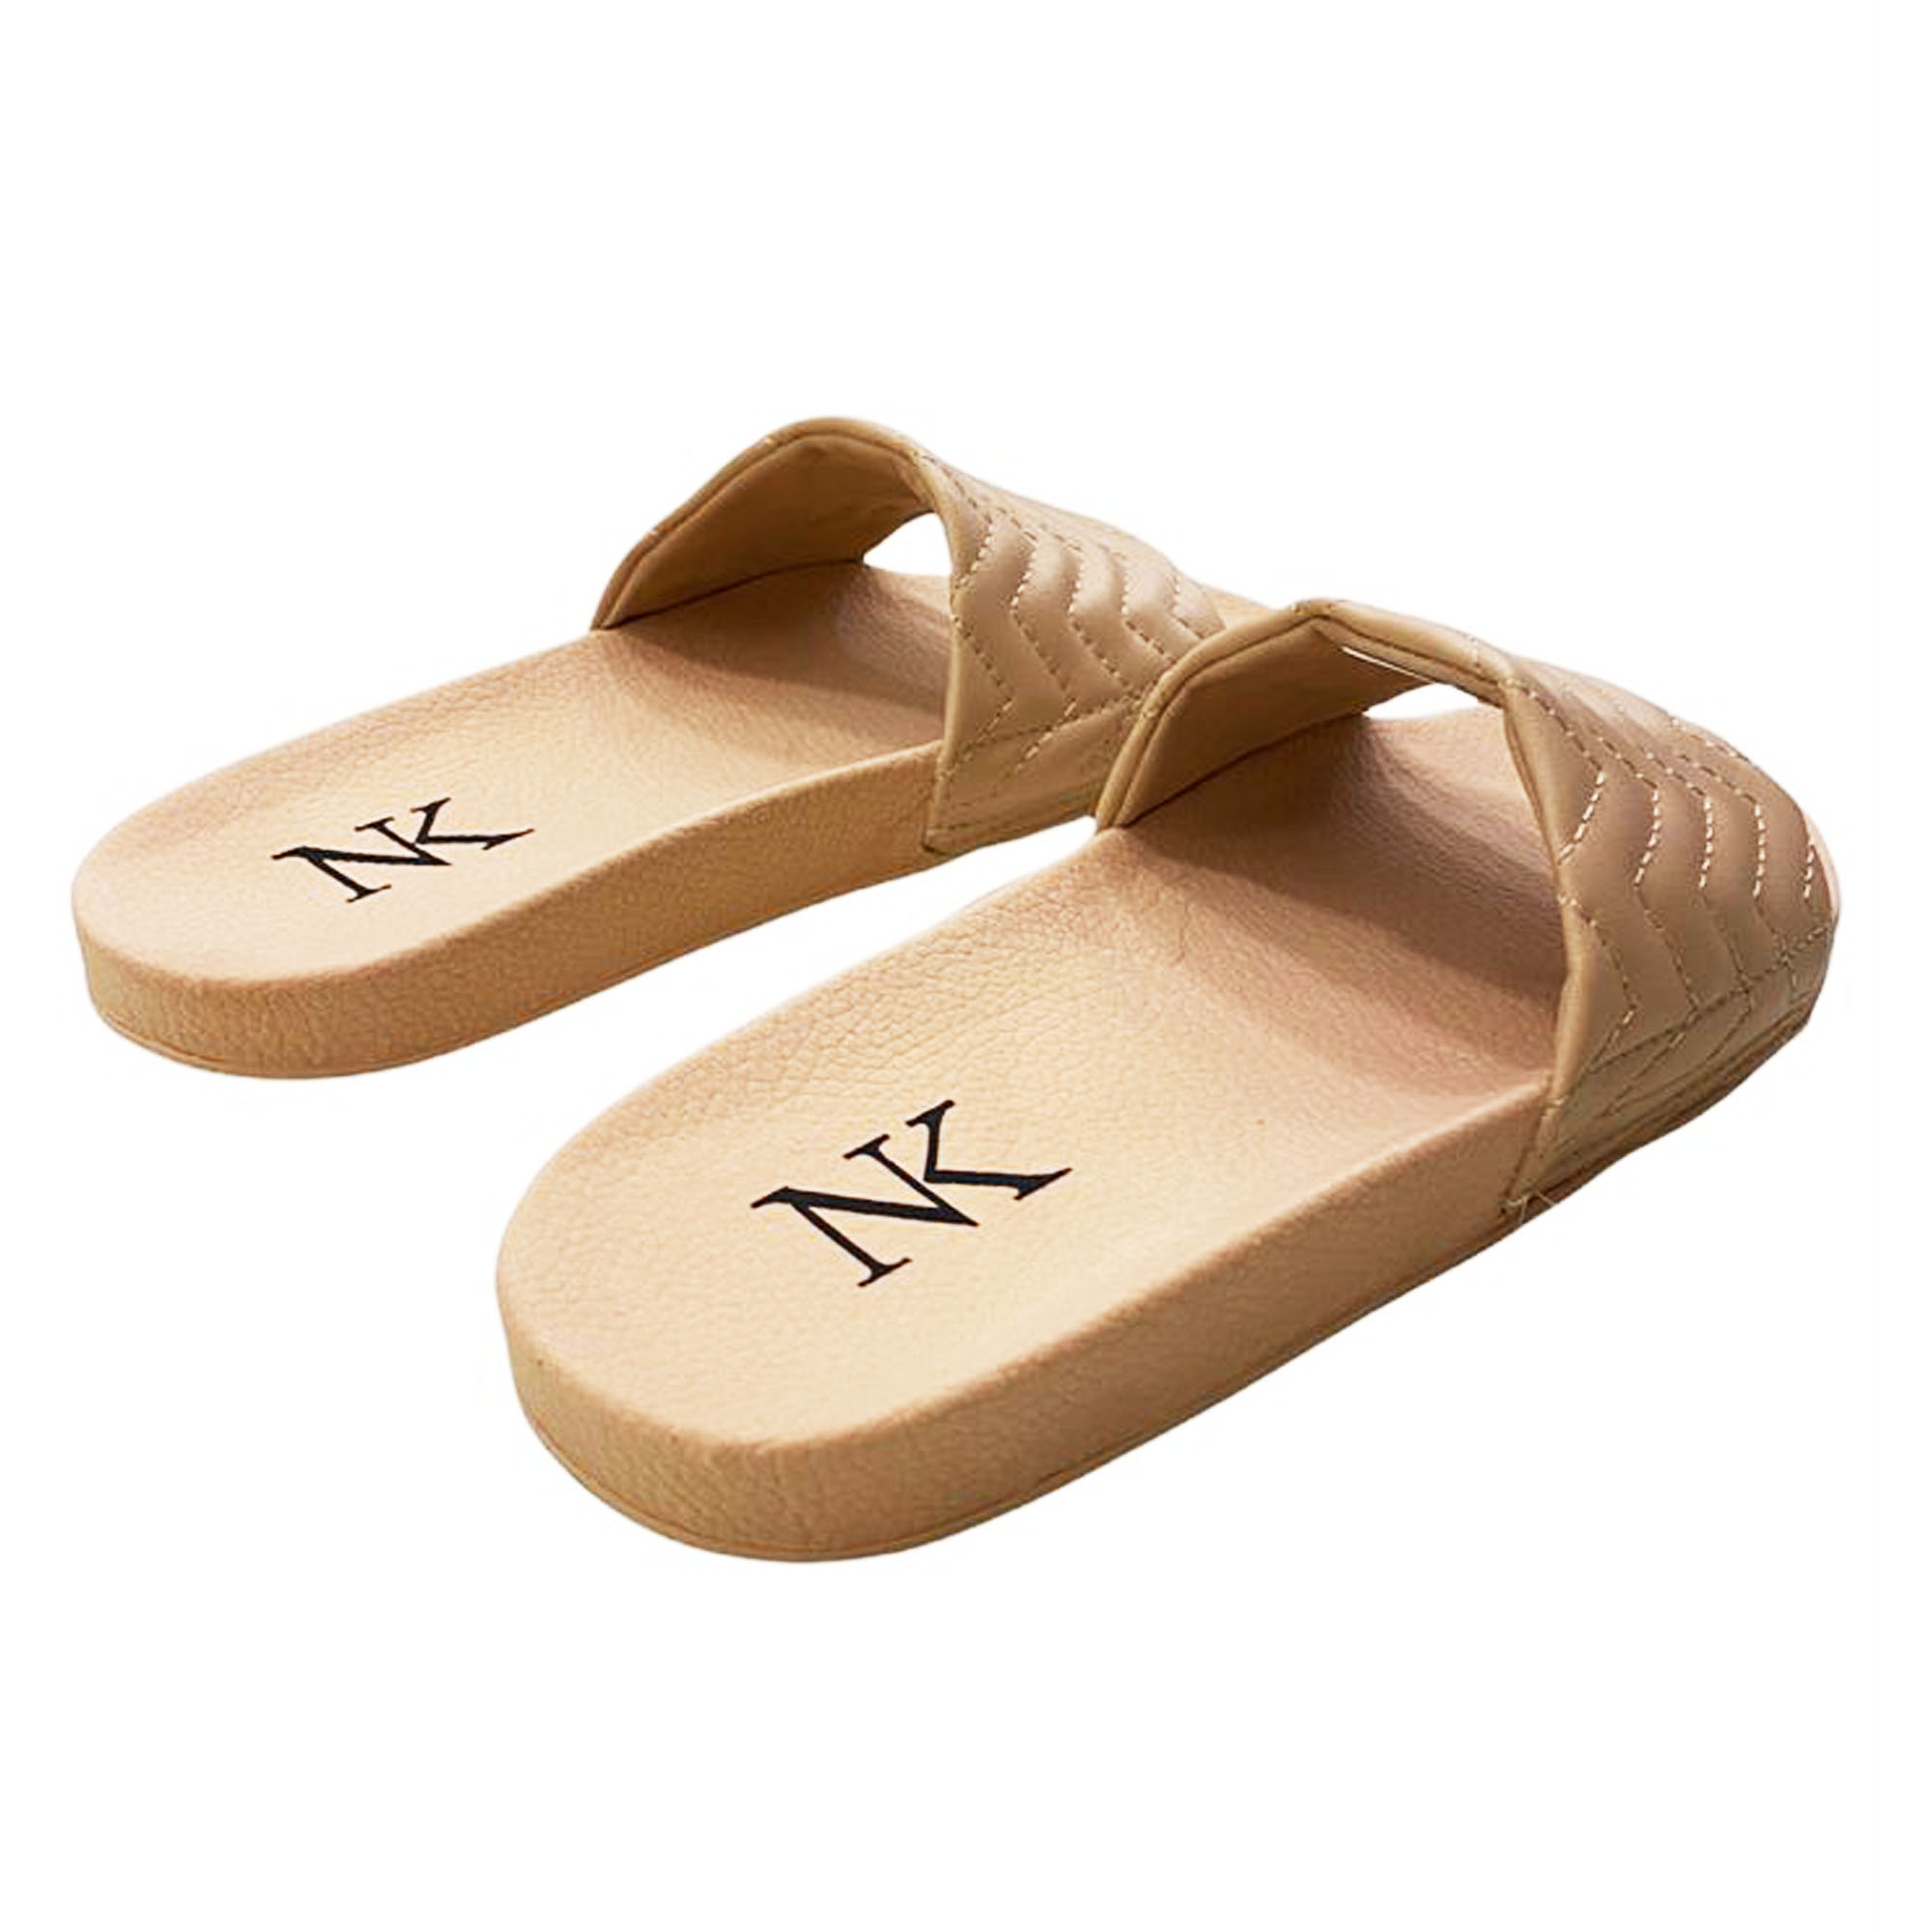 Chinelo Slide Feminino Pedraria NK Shoes - 915-006